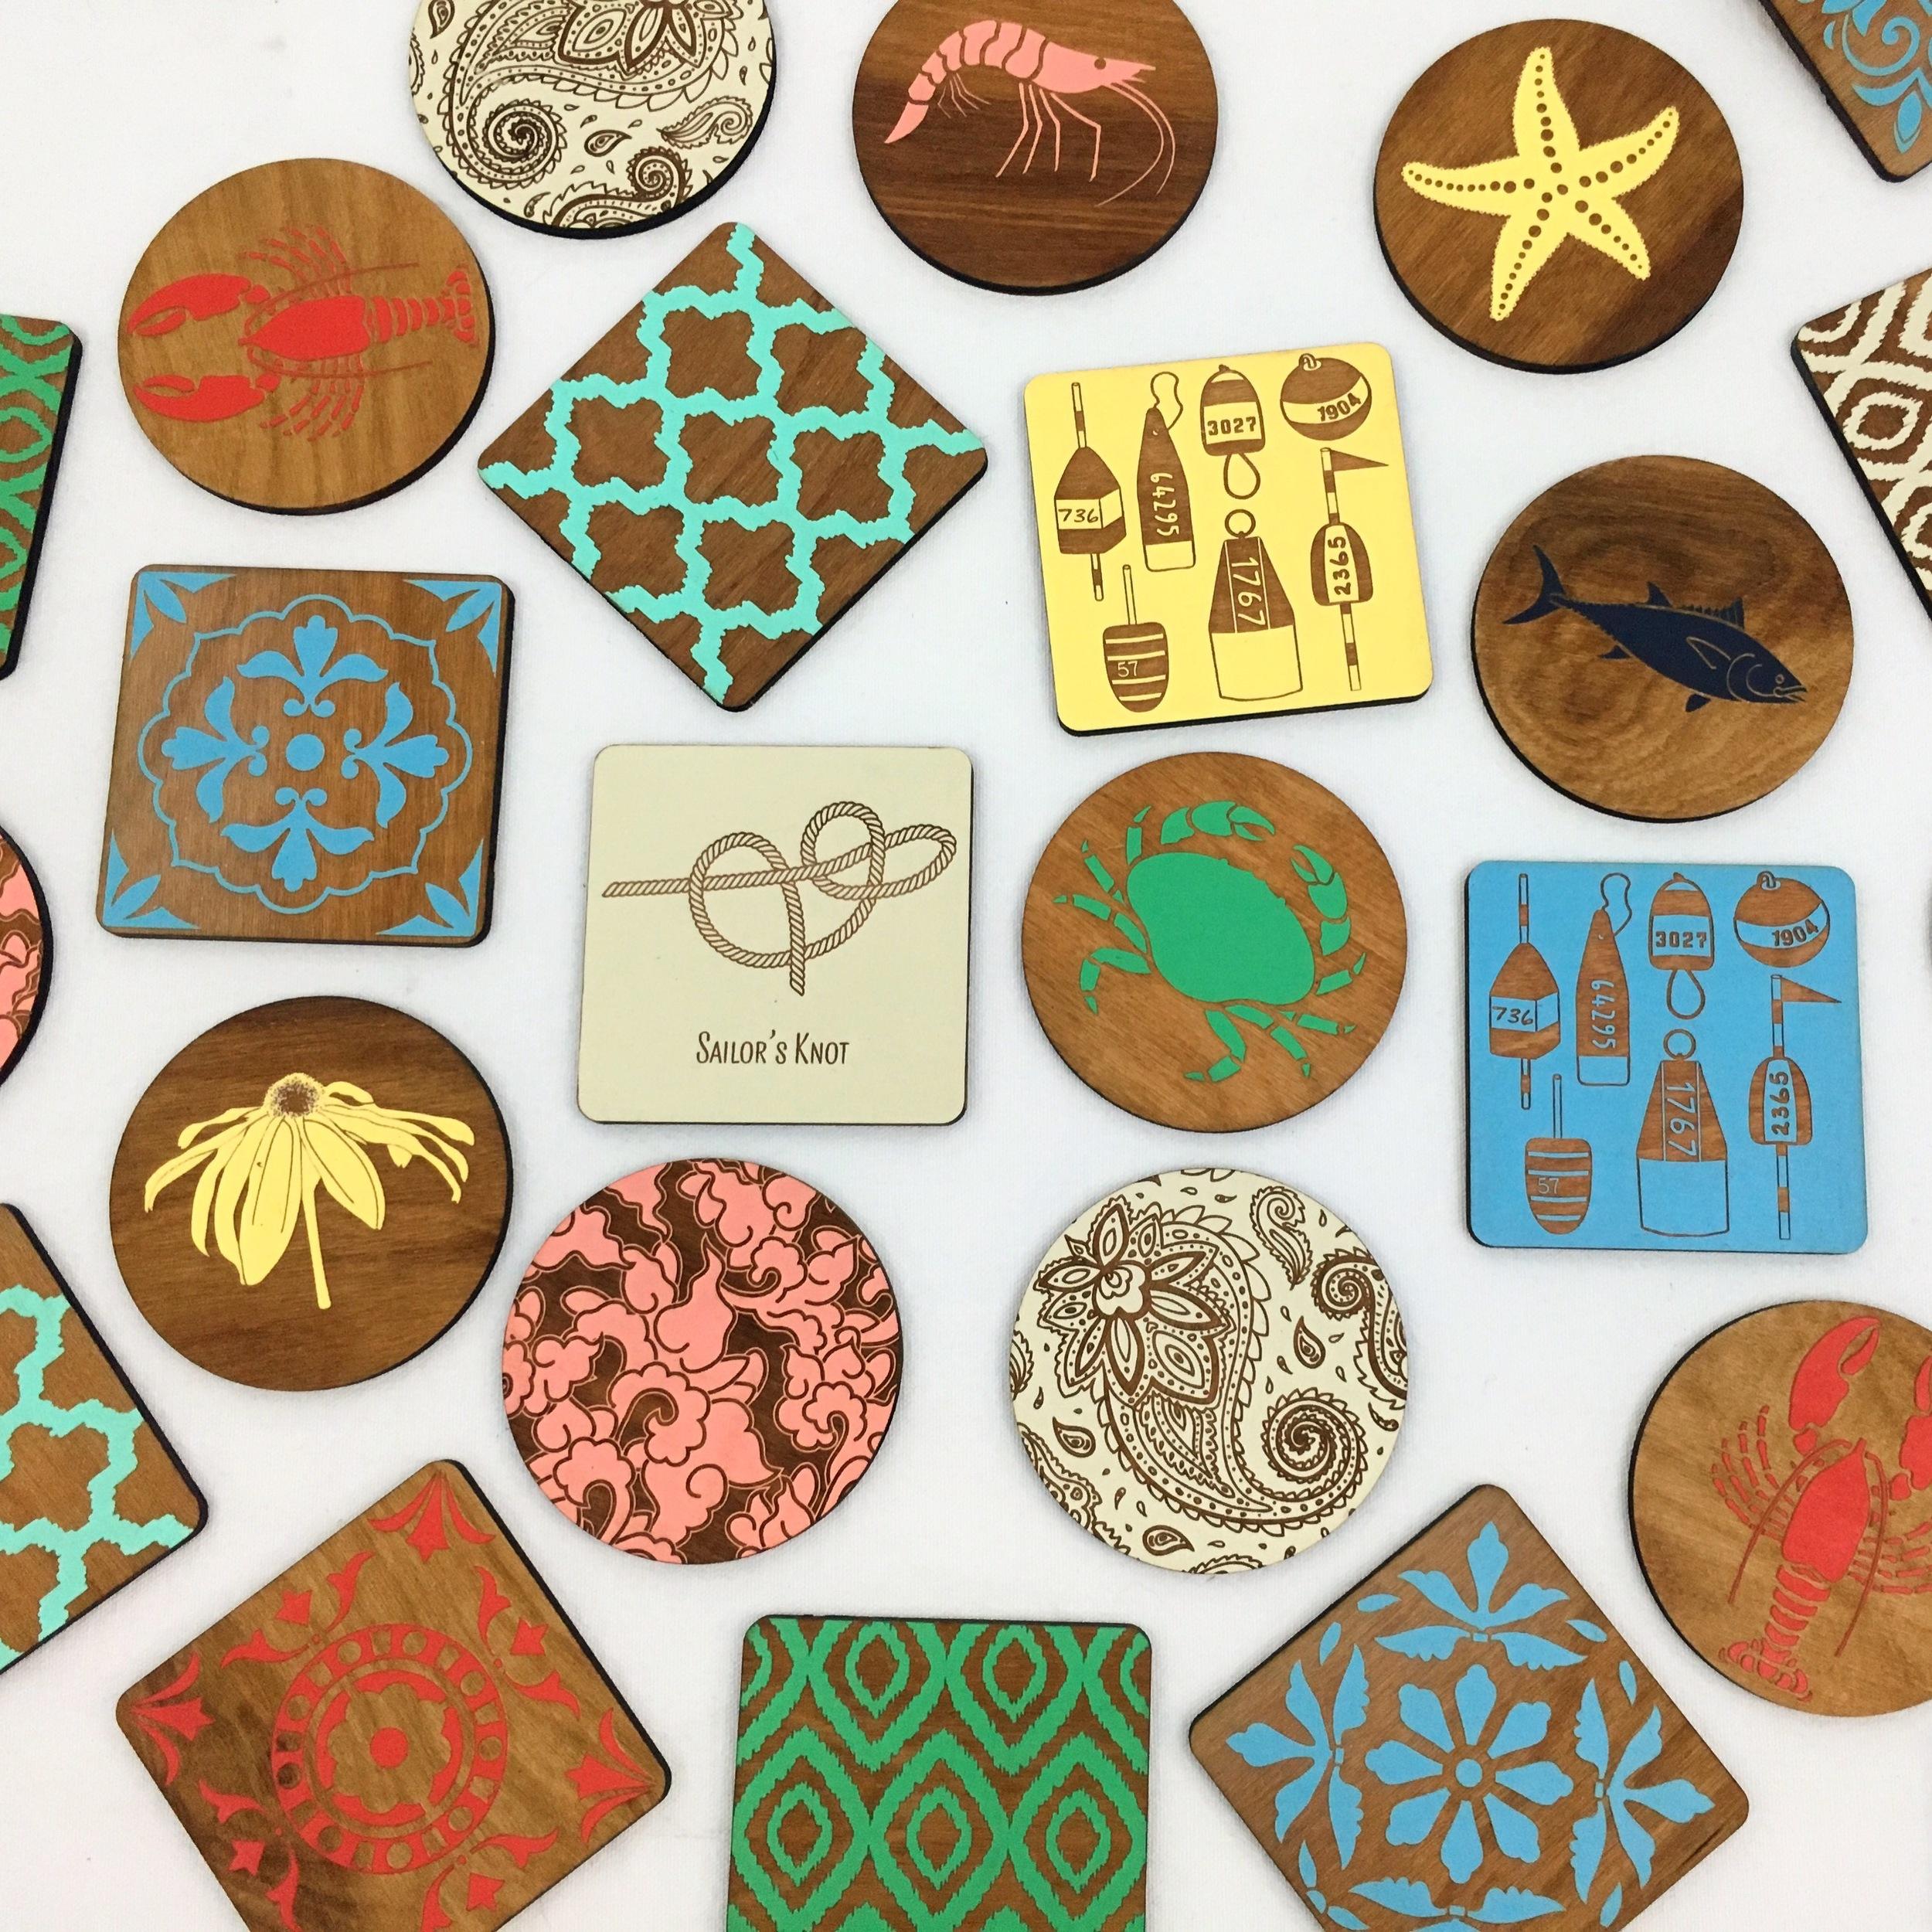 Benoit's Design Co. Coasters (1).JPG